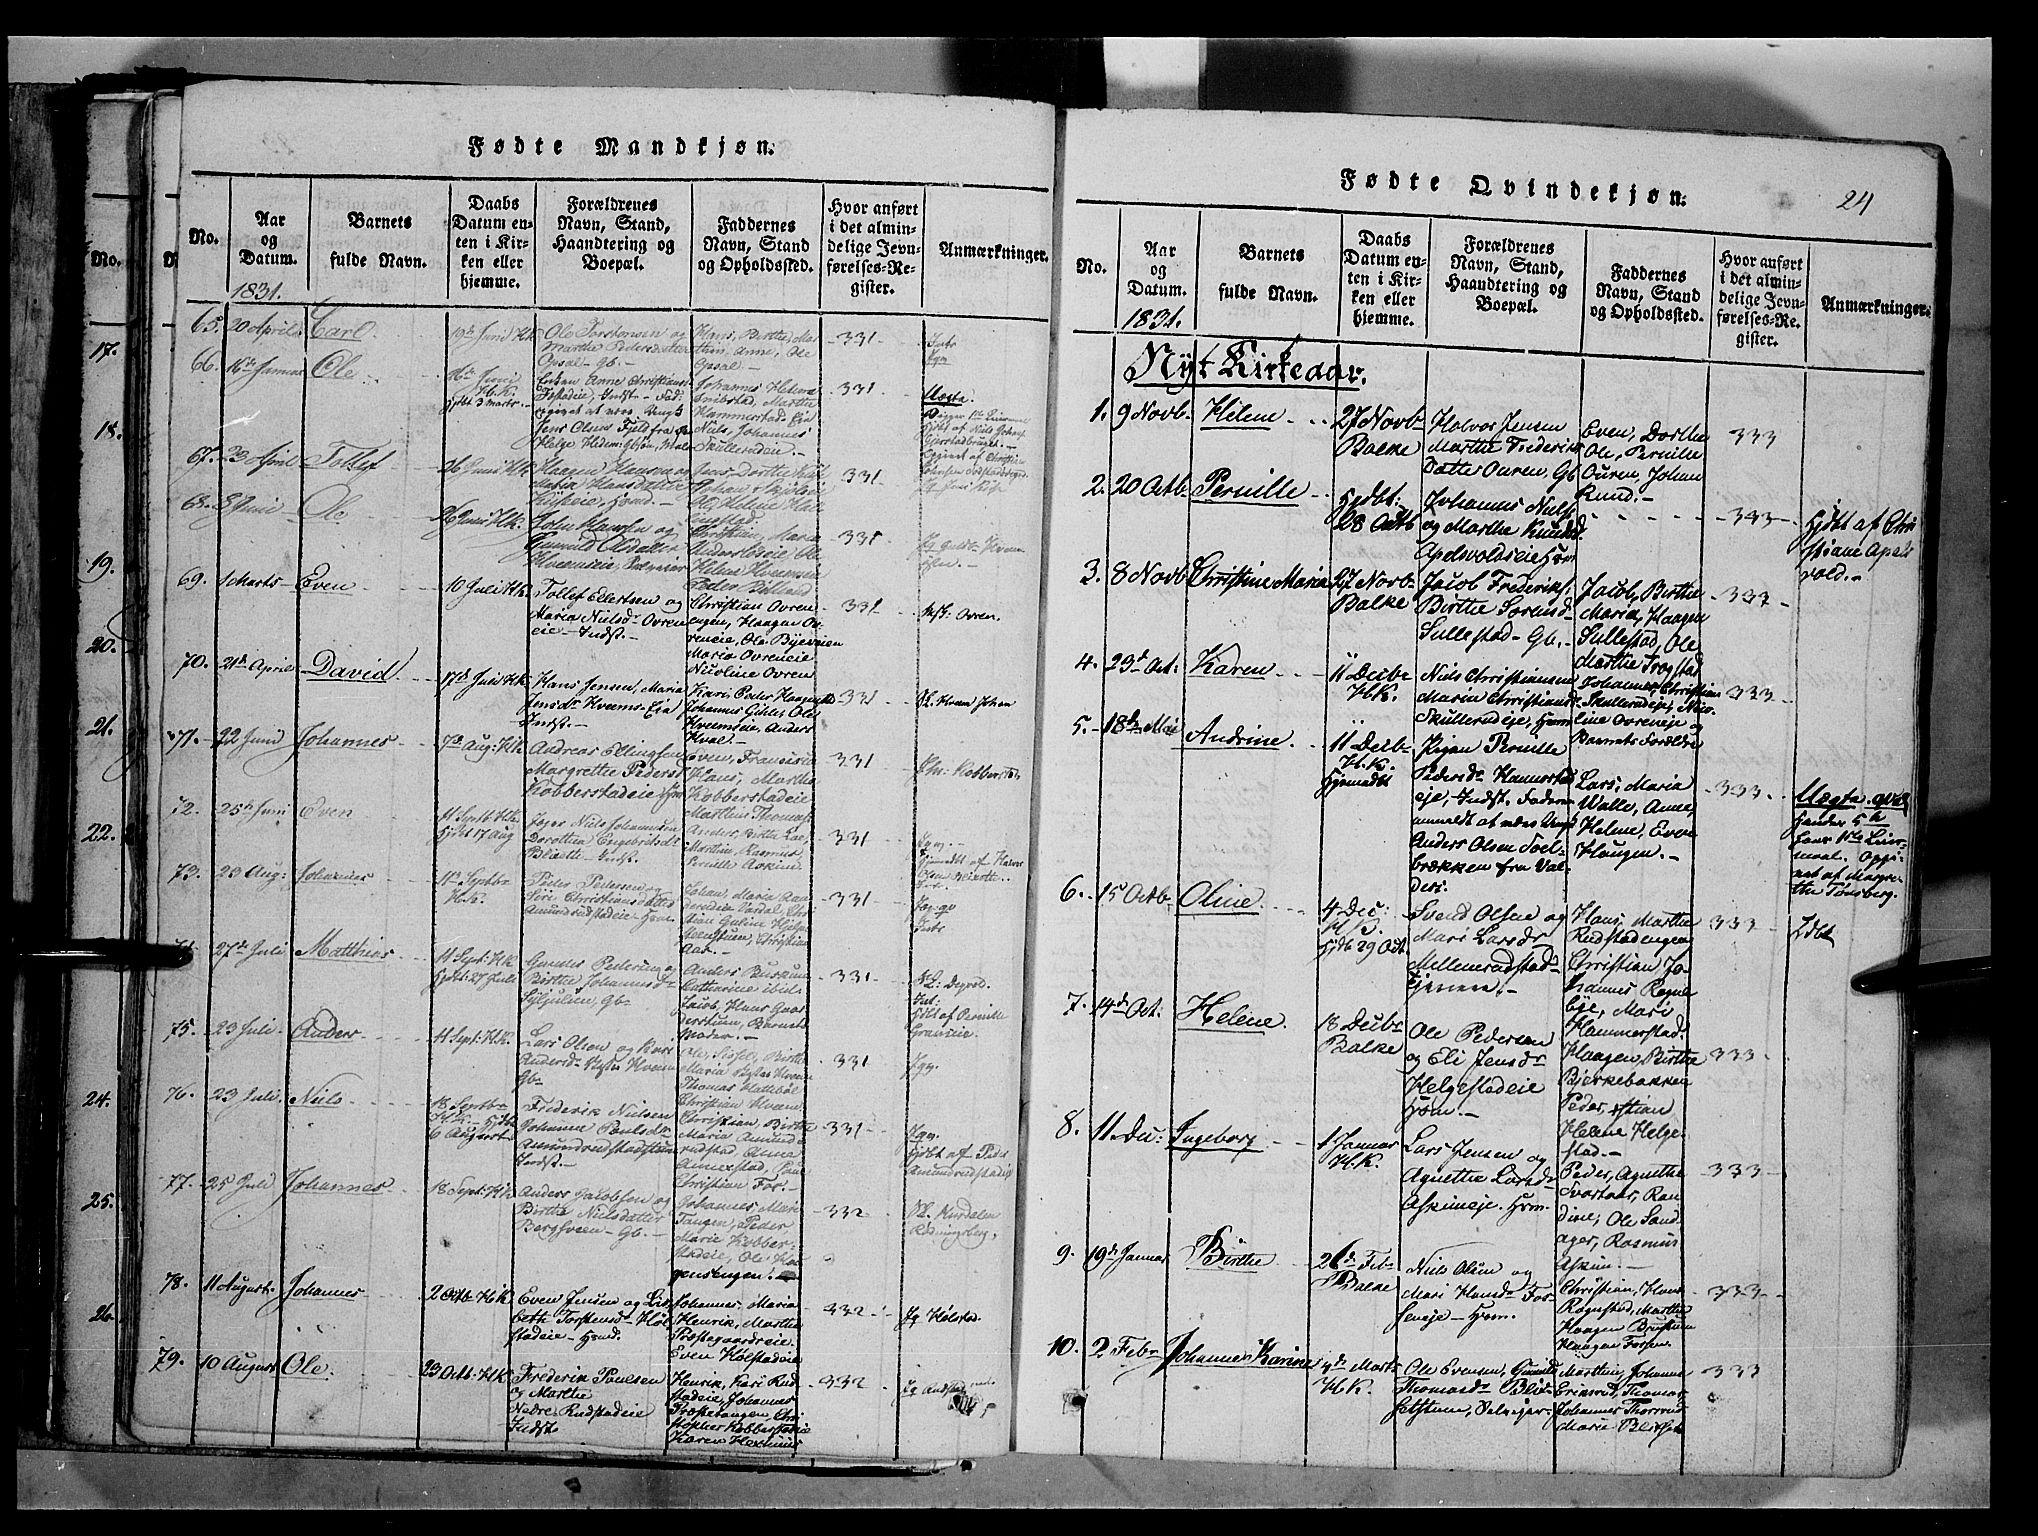 SAH, Østre Toten prestekontor, Ministerialbok nr. 1, 1828-1839, s. 24